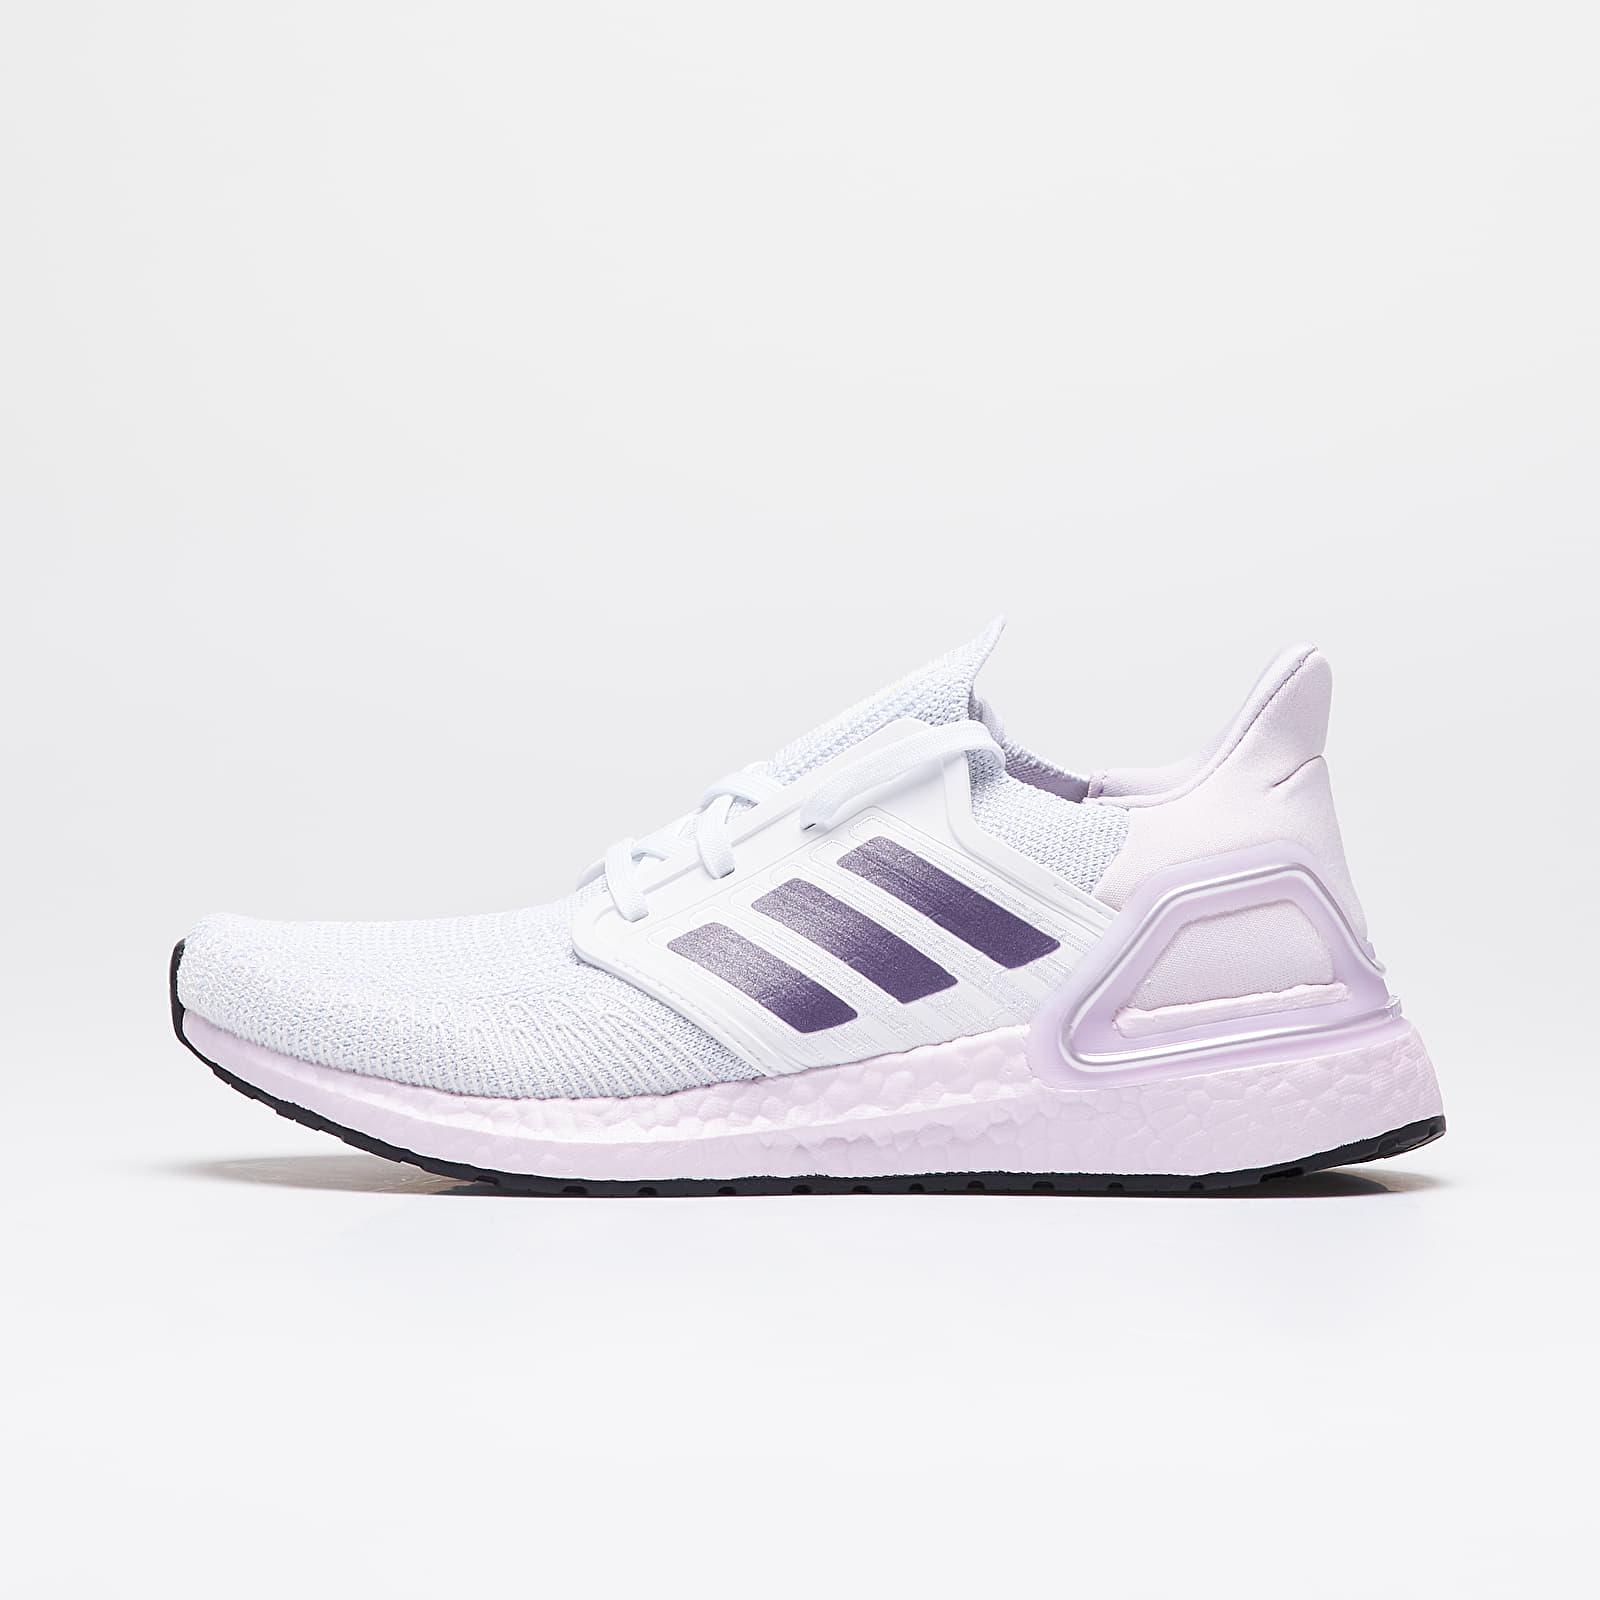 Dámské tenisky a boty adidas UltraBOOST 20 W Ftw White/ Tech Purple/ Purple Tint